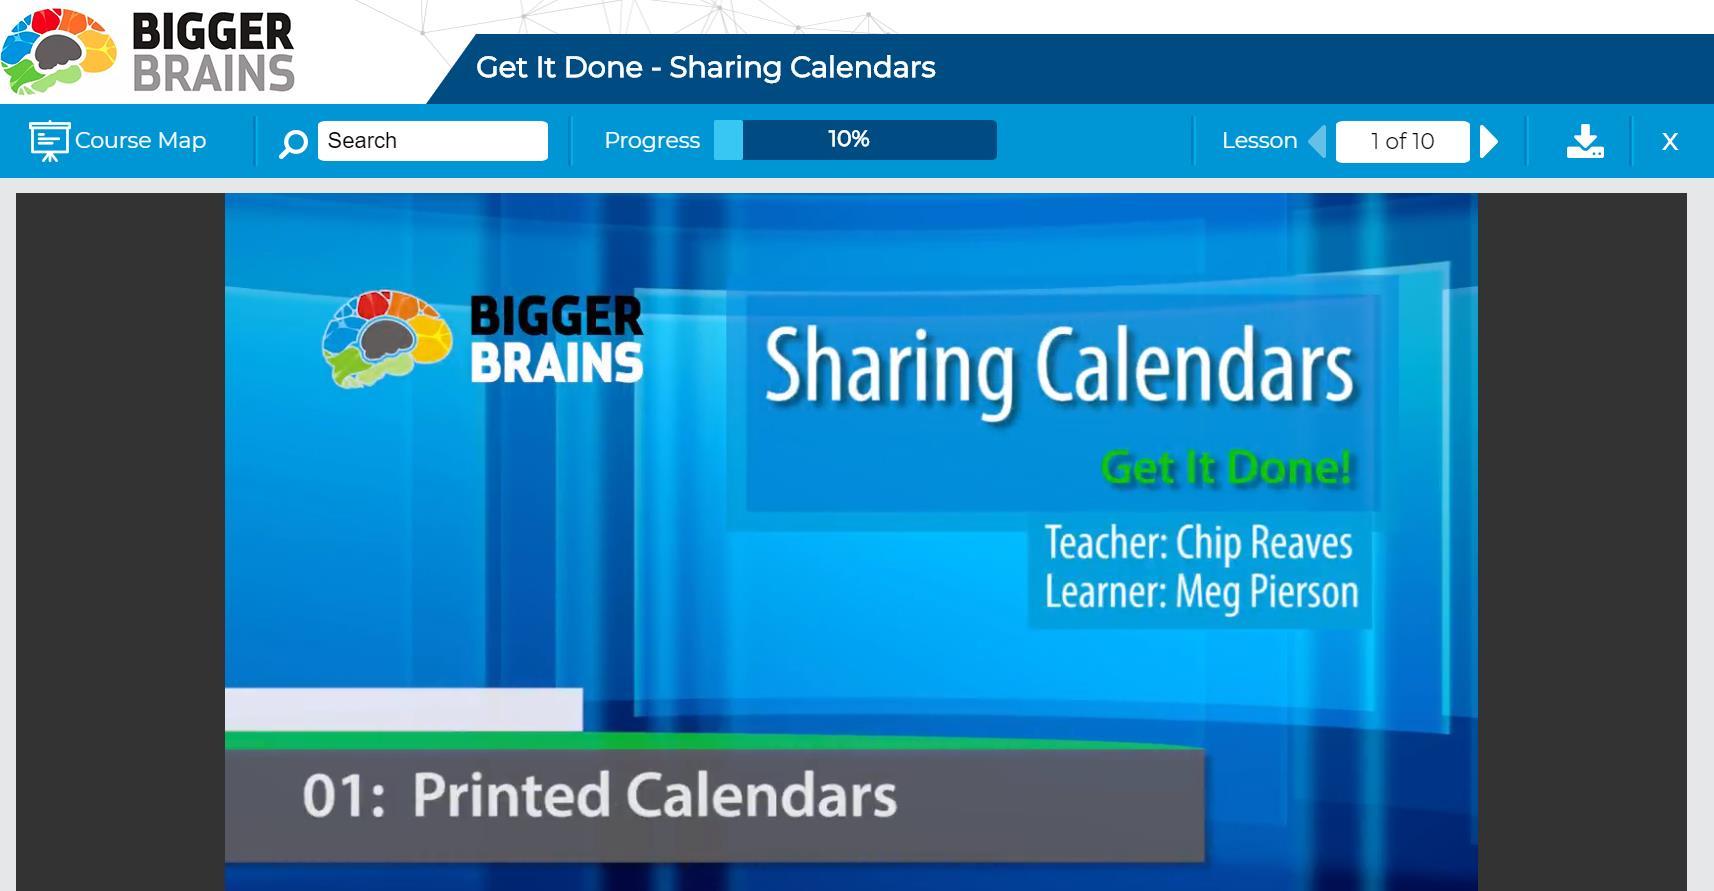 Get-It-Done-Sharing-Calendars.jpg